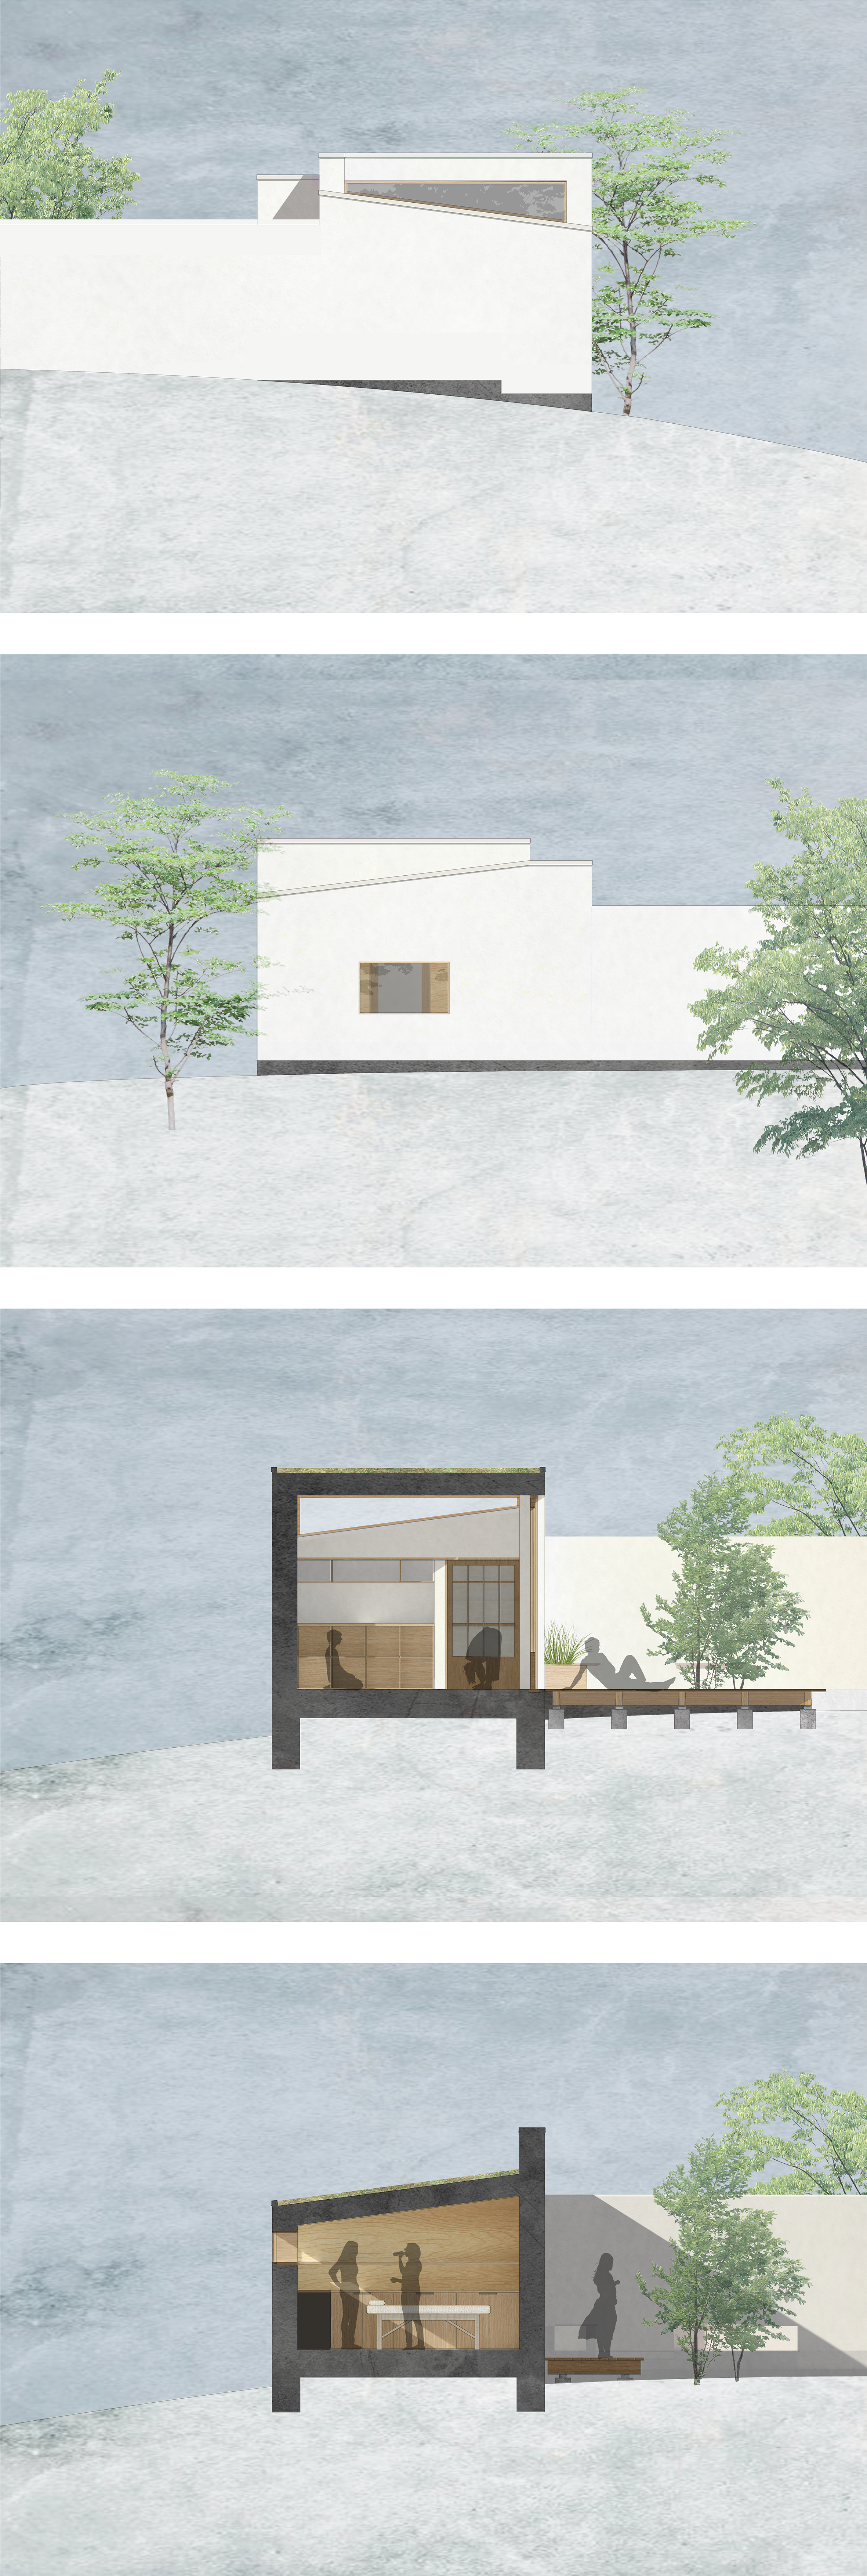 Røntofte Annex facades and sections, Megan Blake, 2017.